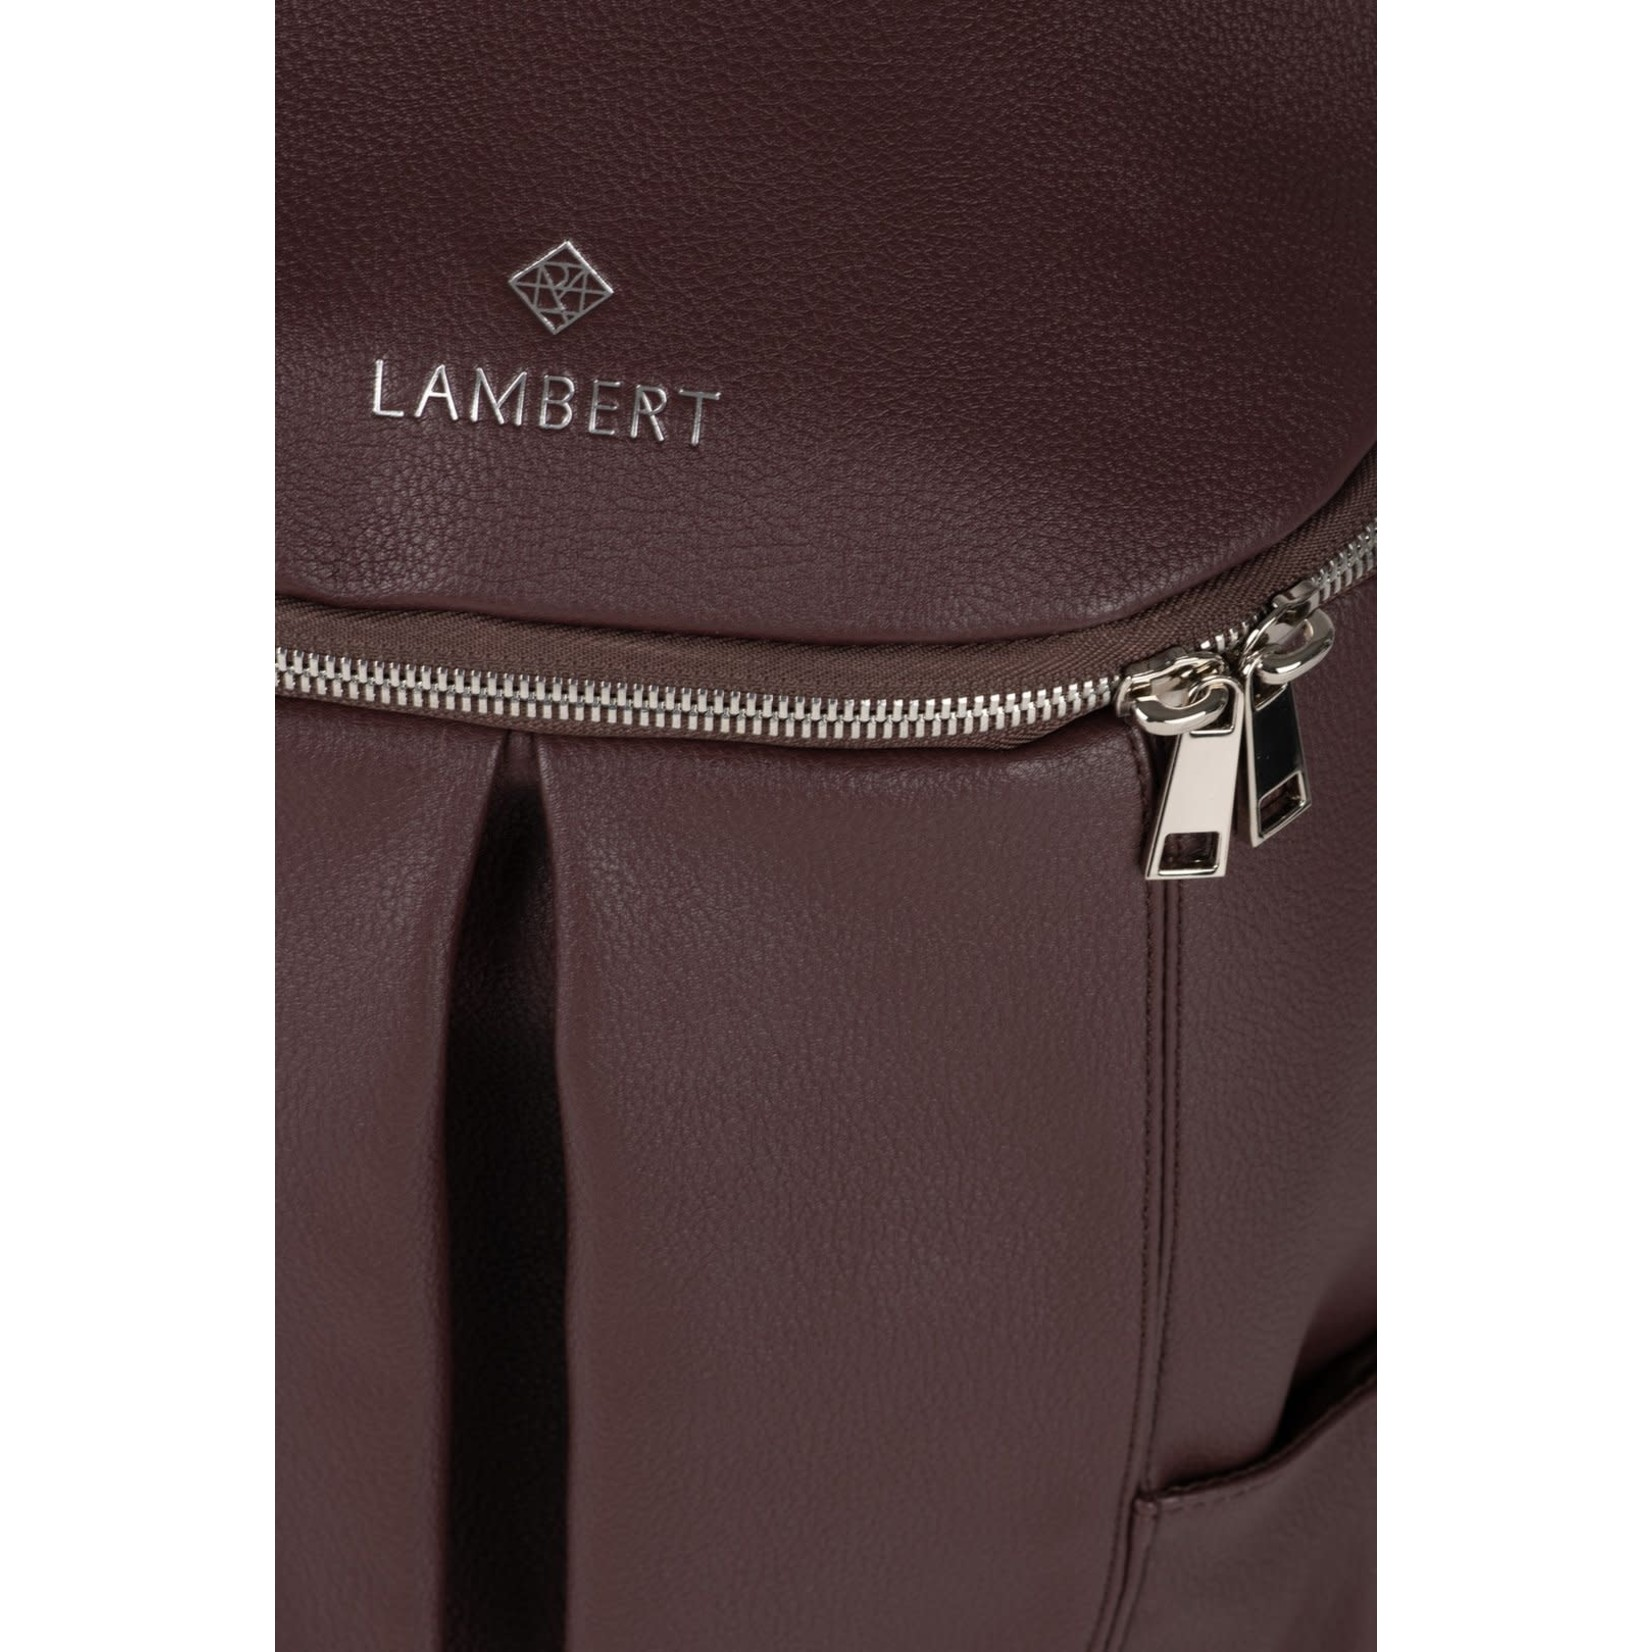 Lambert Lambert SARA brunette